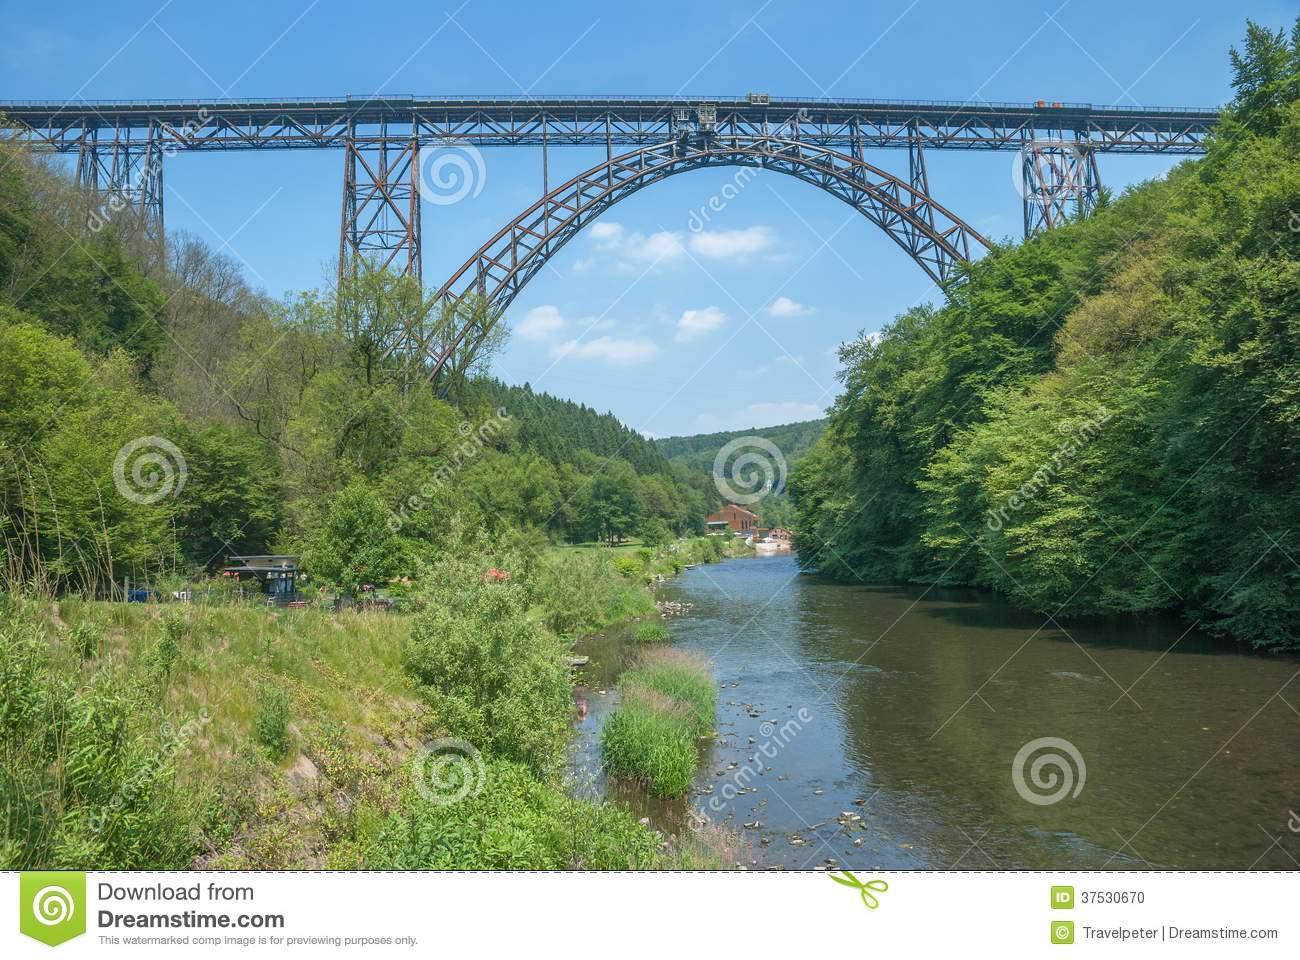 Muengstener Bruecke,Wupper River,Solingen,Germany Stock Photo.